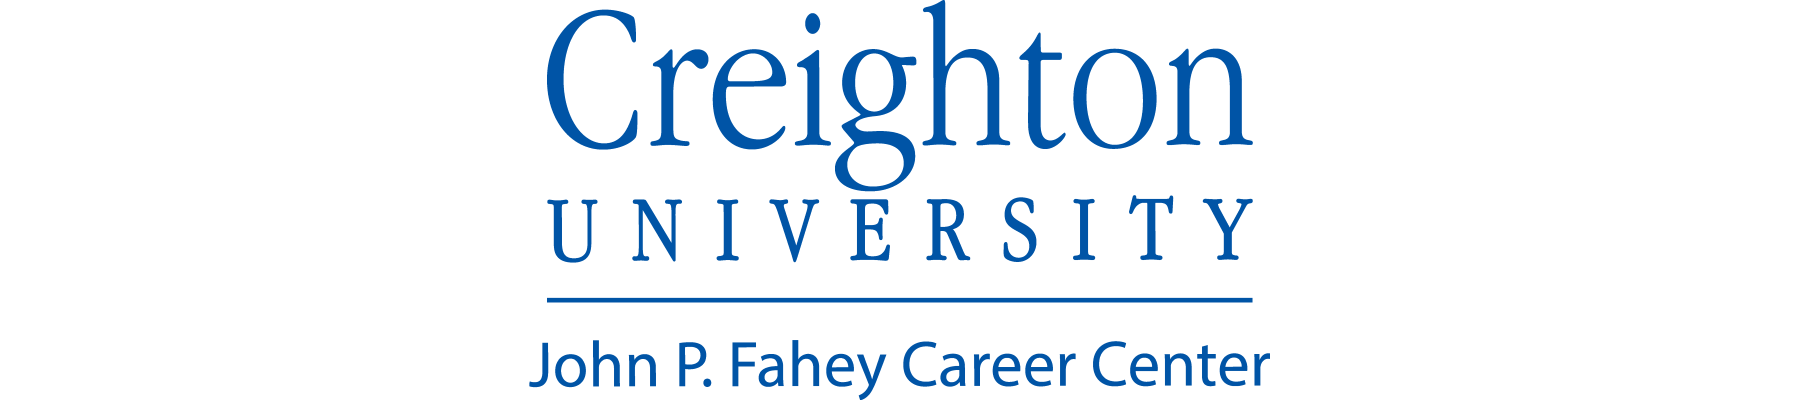 Creighton University Banner